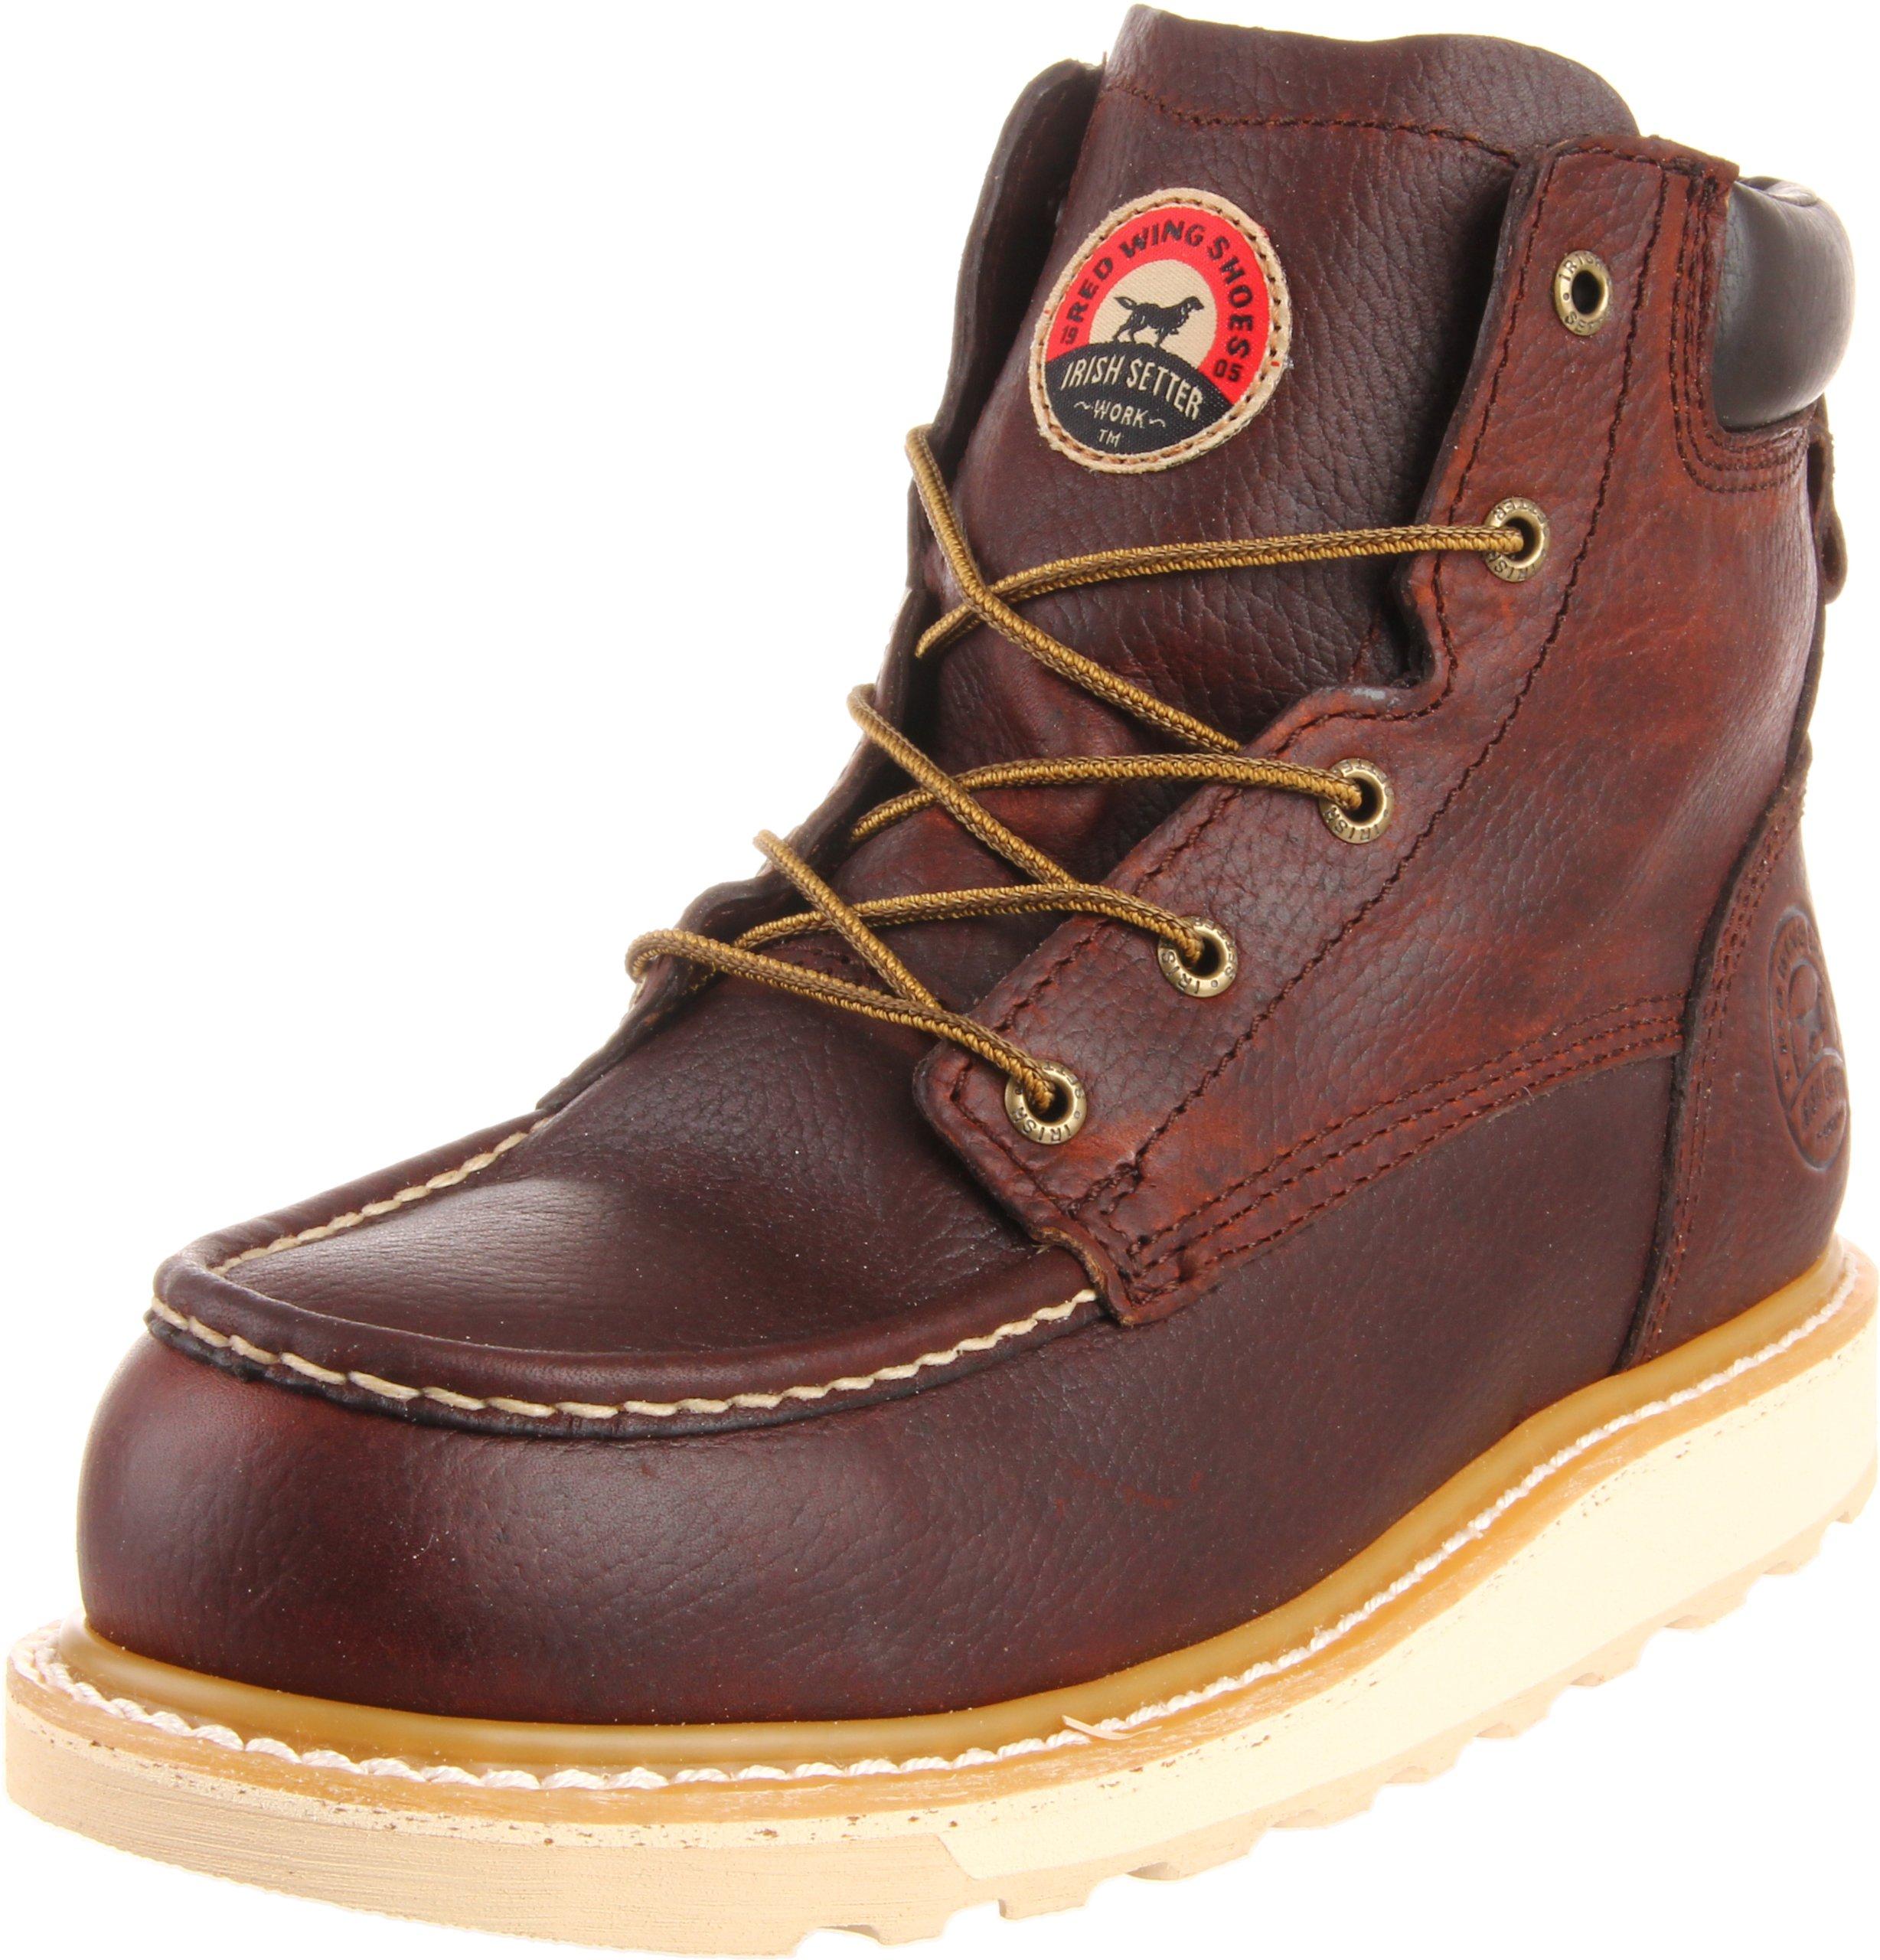 Irish Setter Men's 83606 6'' Aluminum Toe Work Boot,Brown,10 D US by Irish Setter